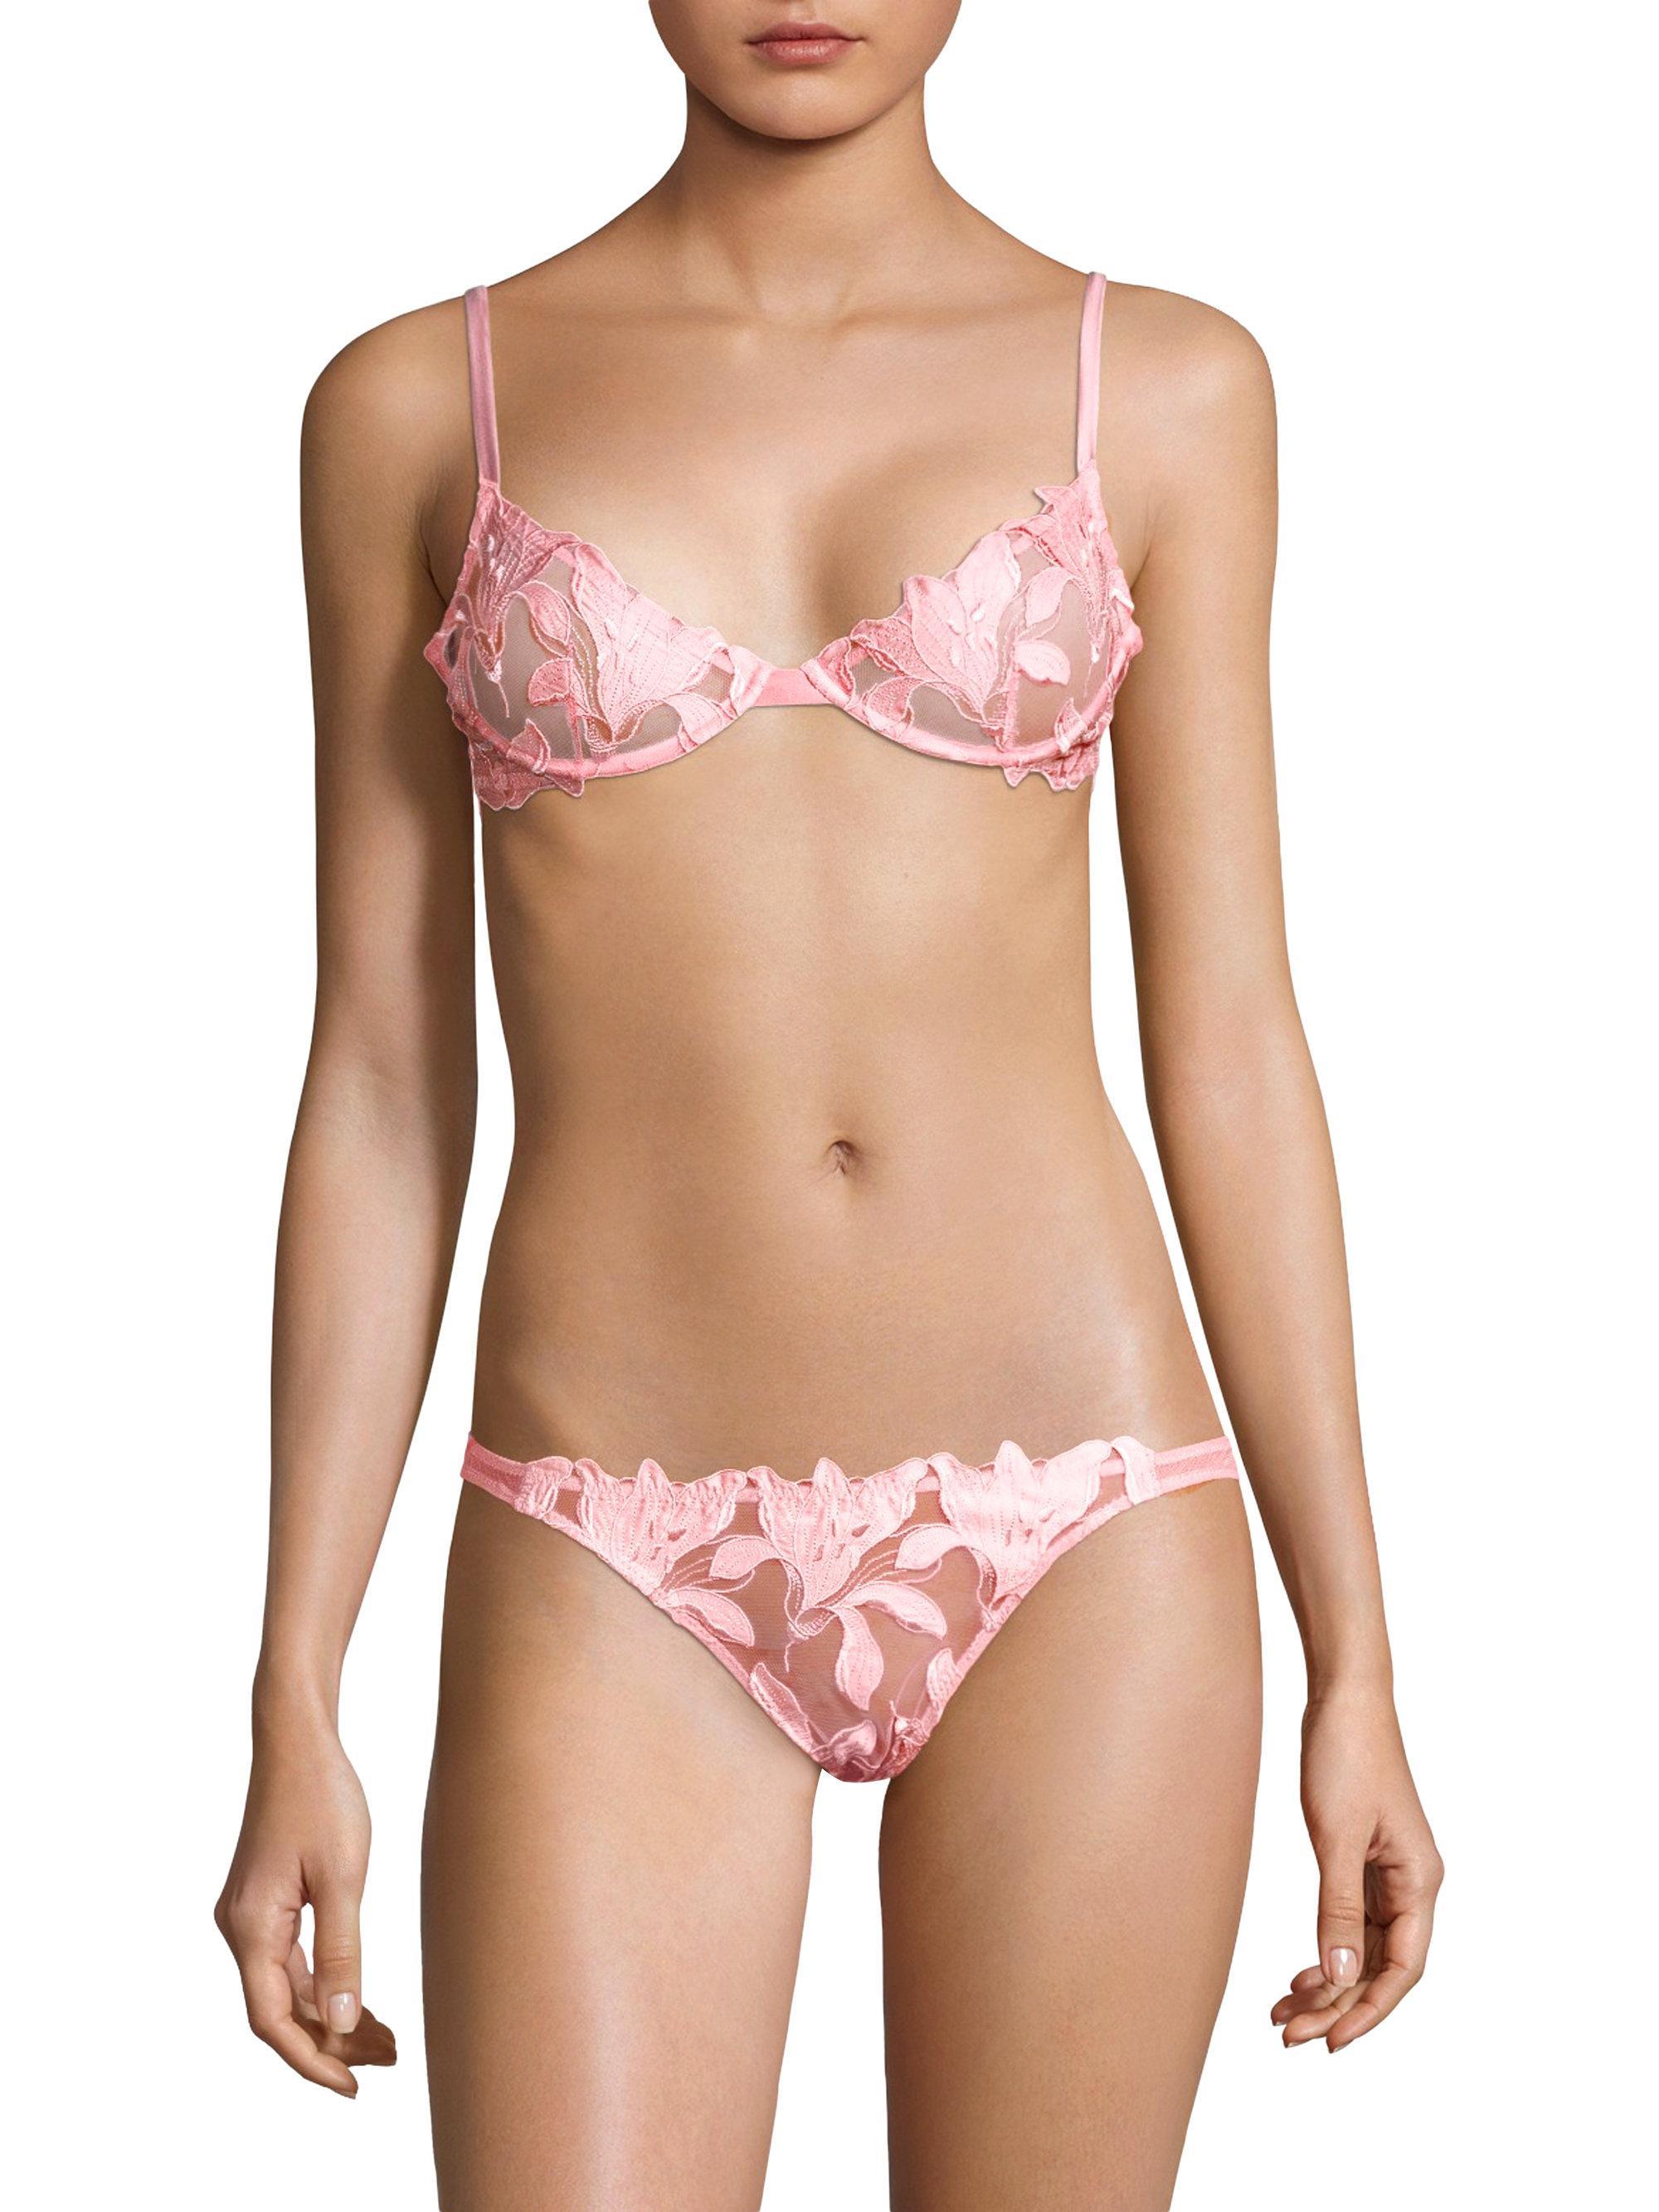 long triangle bikini top - Pink & Purple Fleur du Mal Really Cheap Online Low Shipping For Sale Shop Offer Sale Online 63VeYfhs